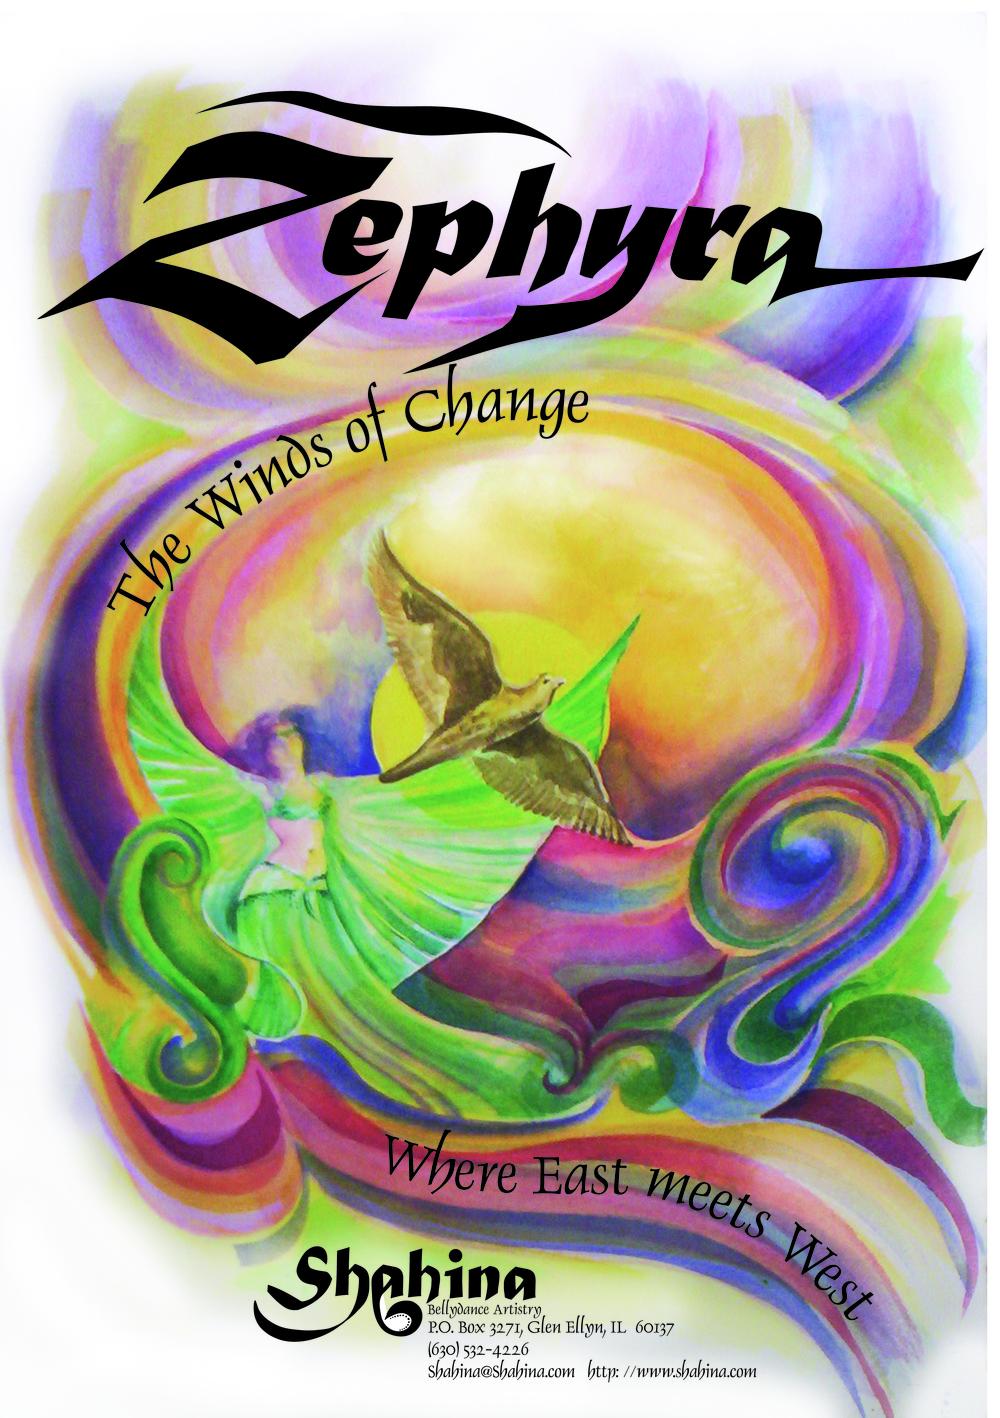 Zephyra.jpg